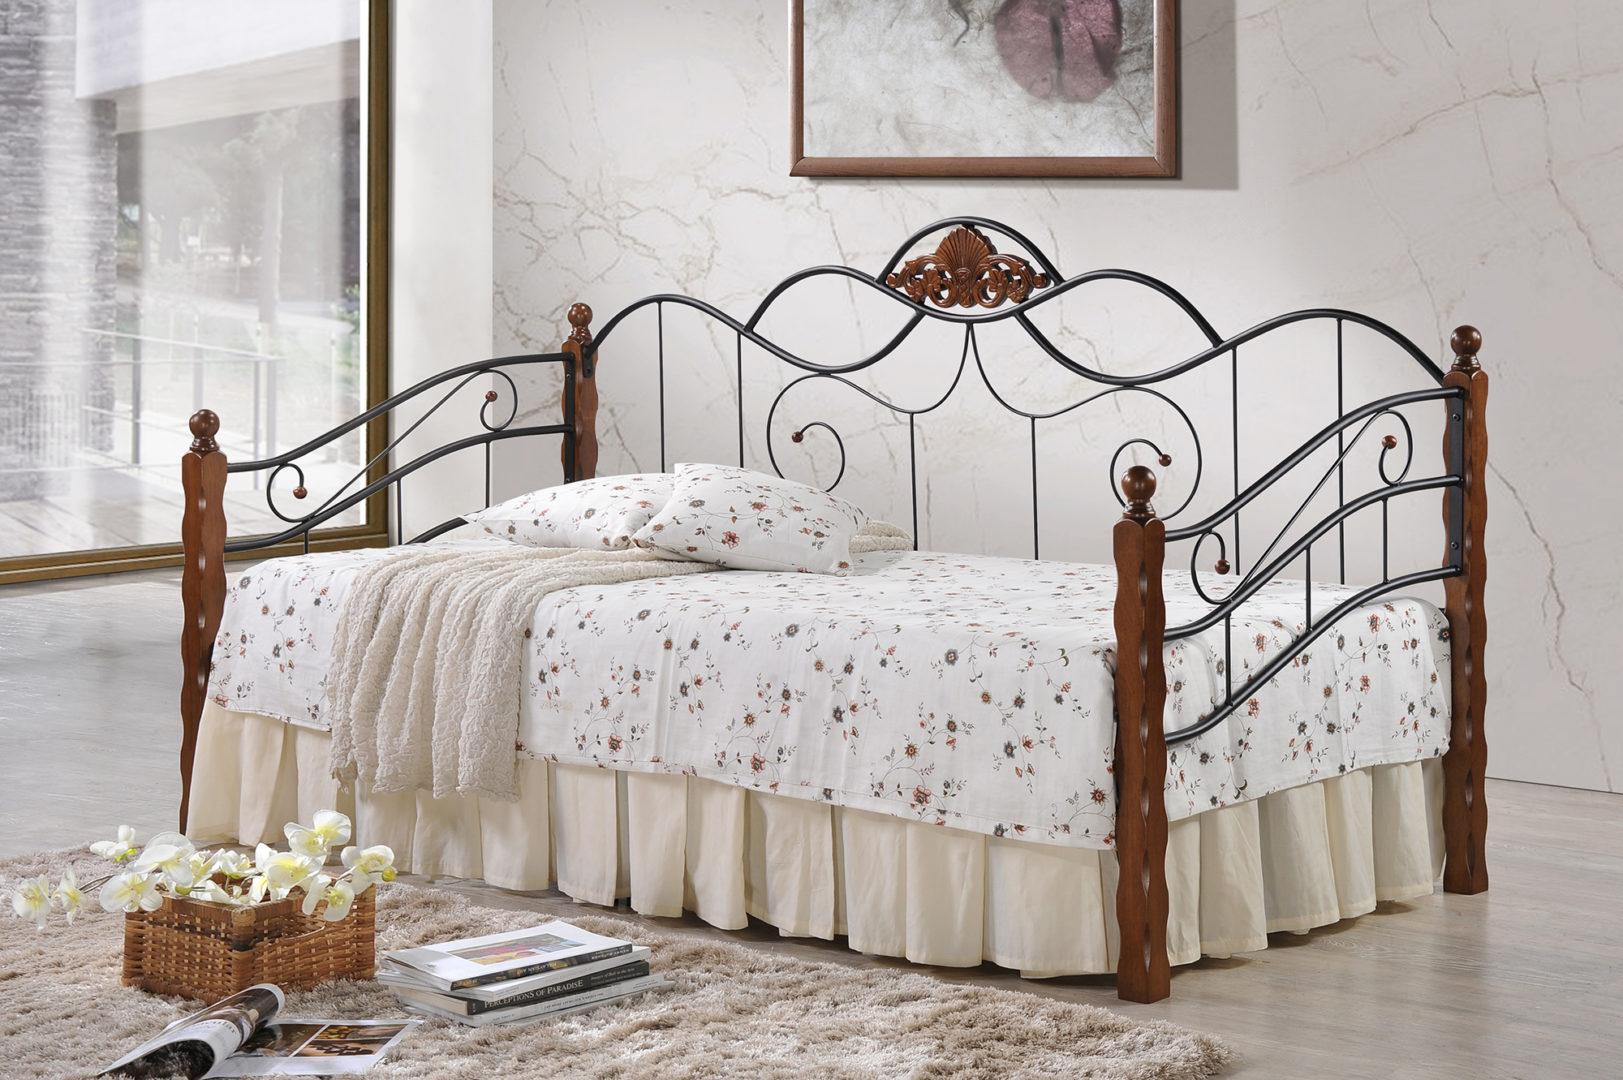 Кровать-кушетка Канцона (Canzona) (90 см x 200 см)